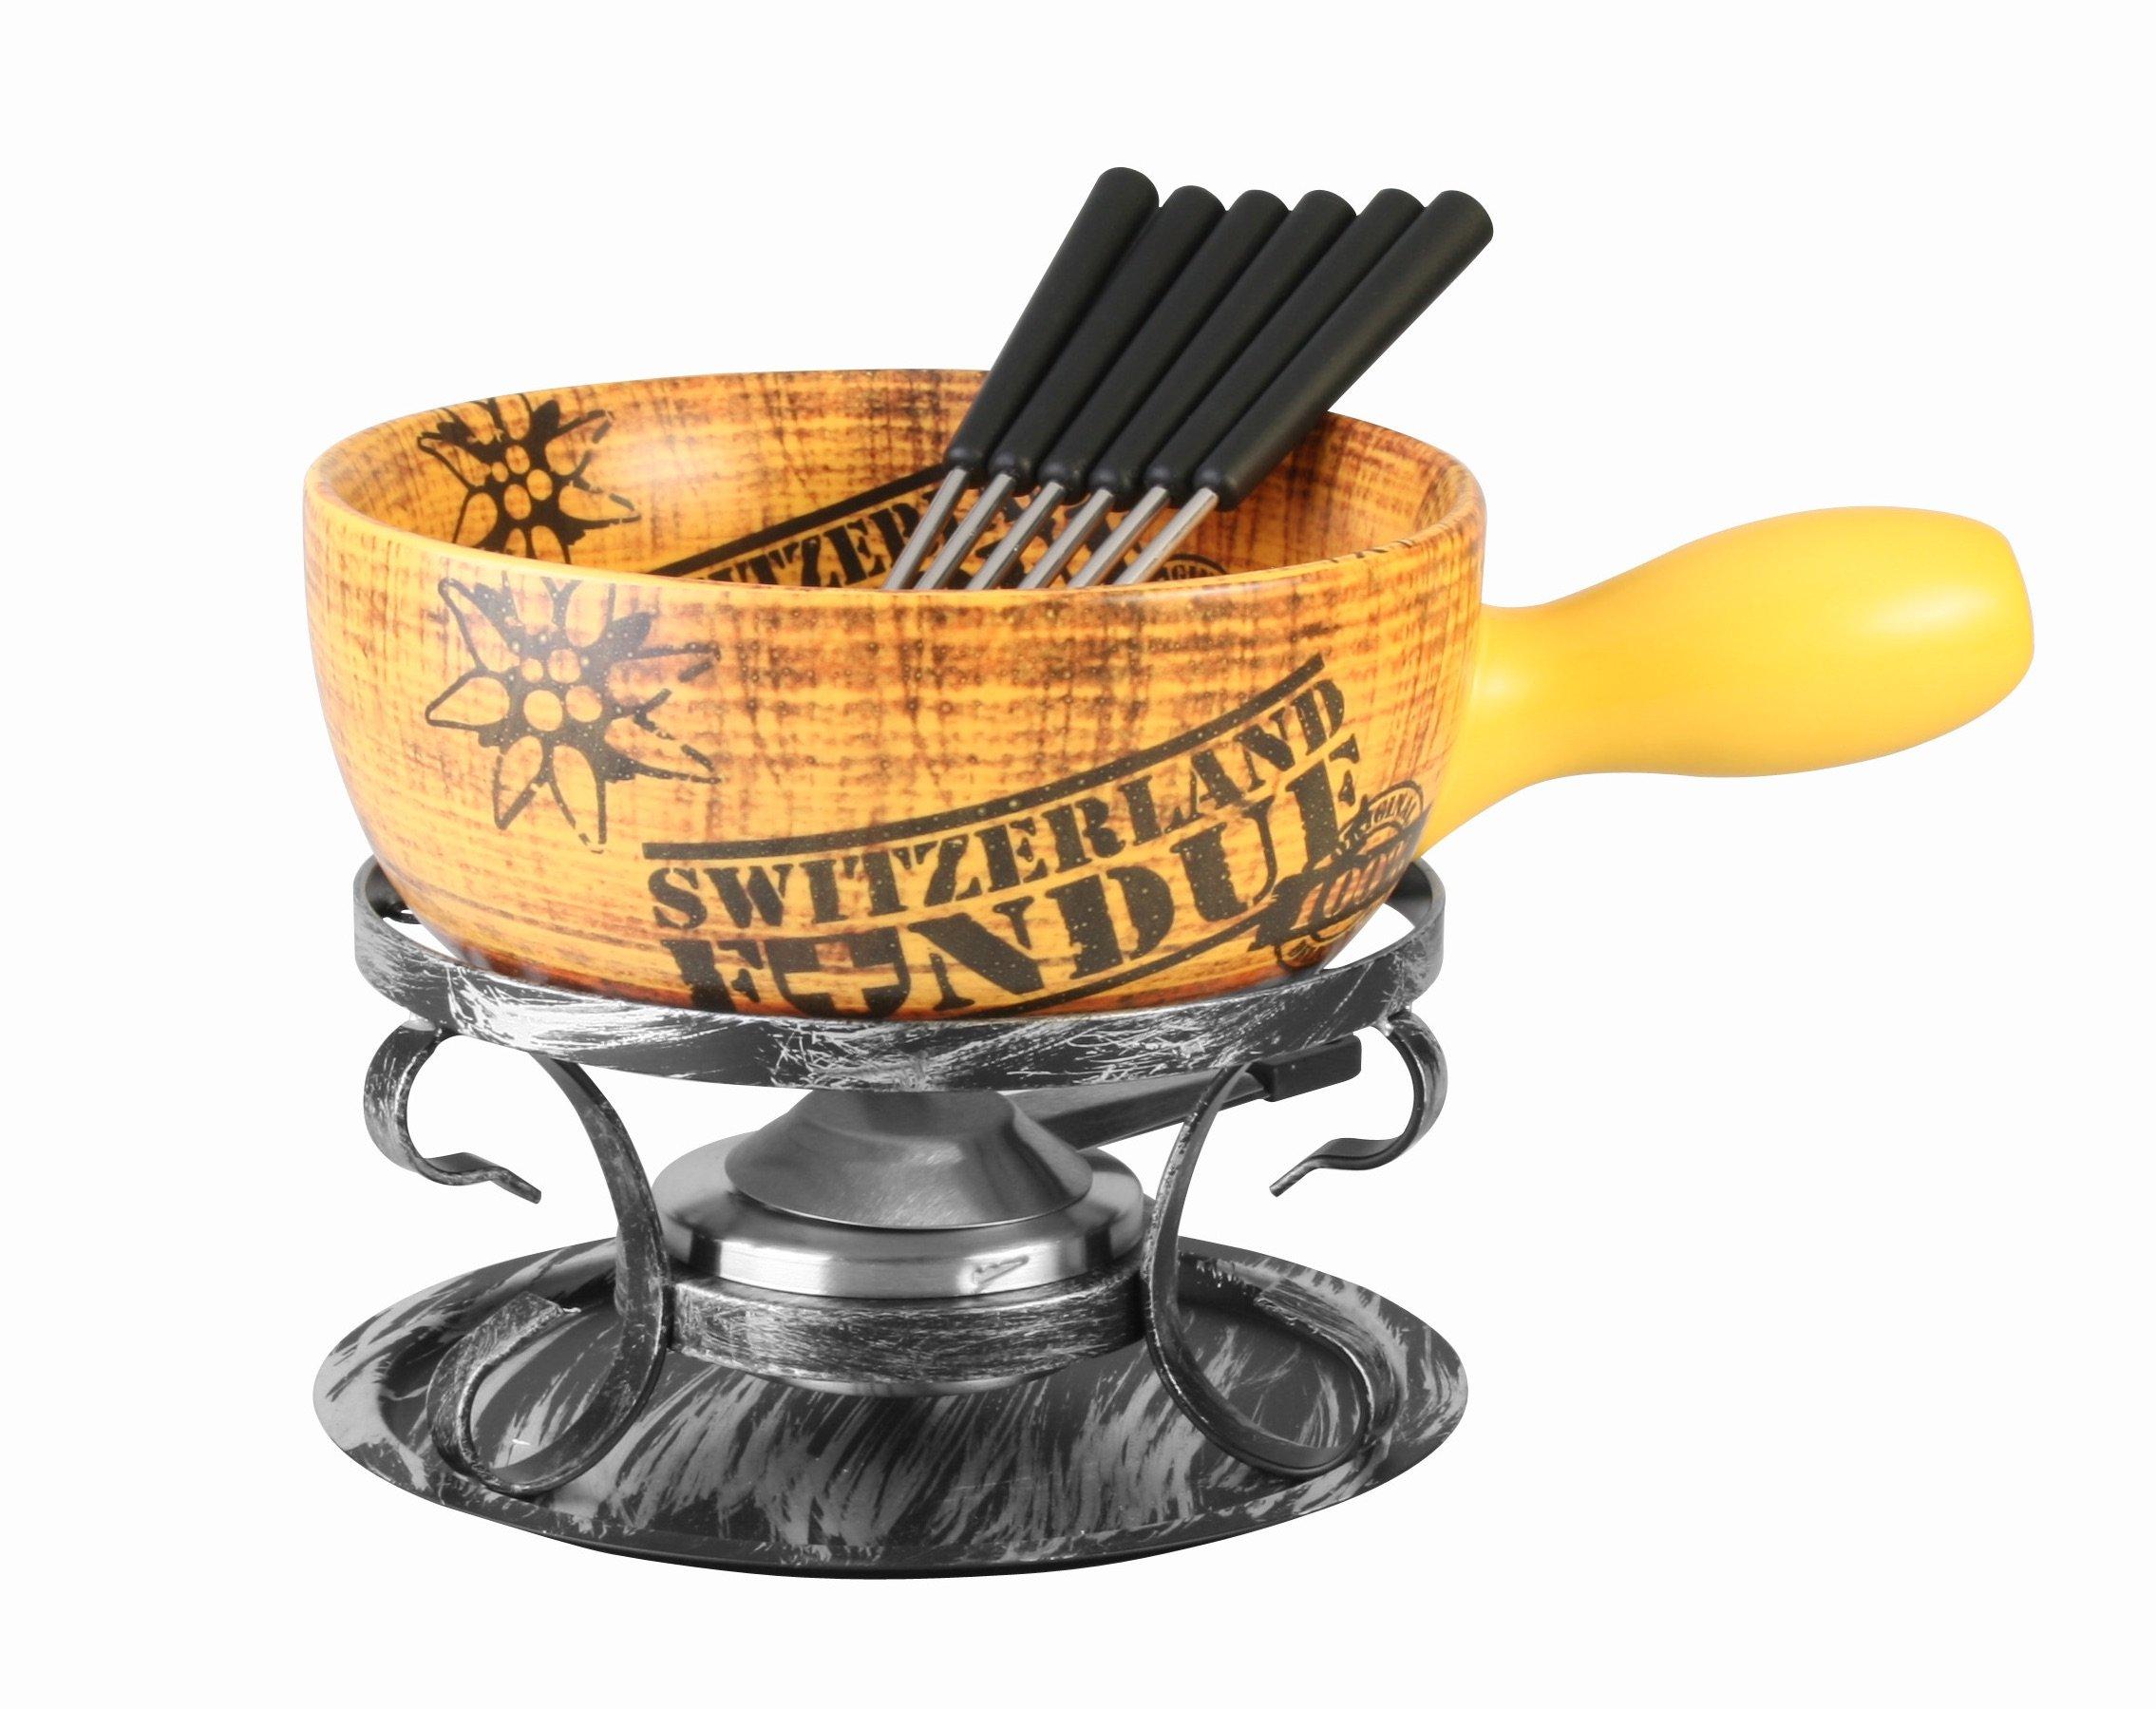 Artestia Ceramic Cheese Cooking (Fondue Set - Swiss Vintage) by Artestia